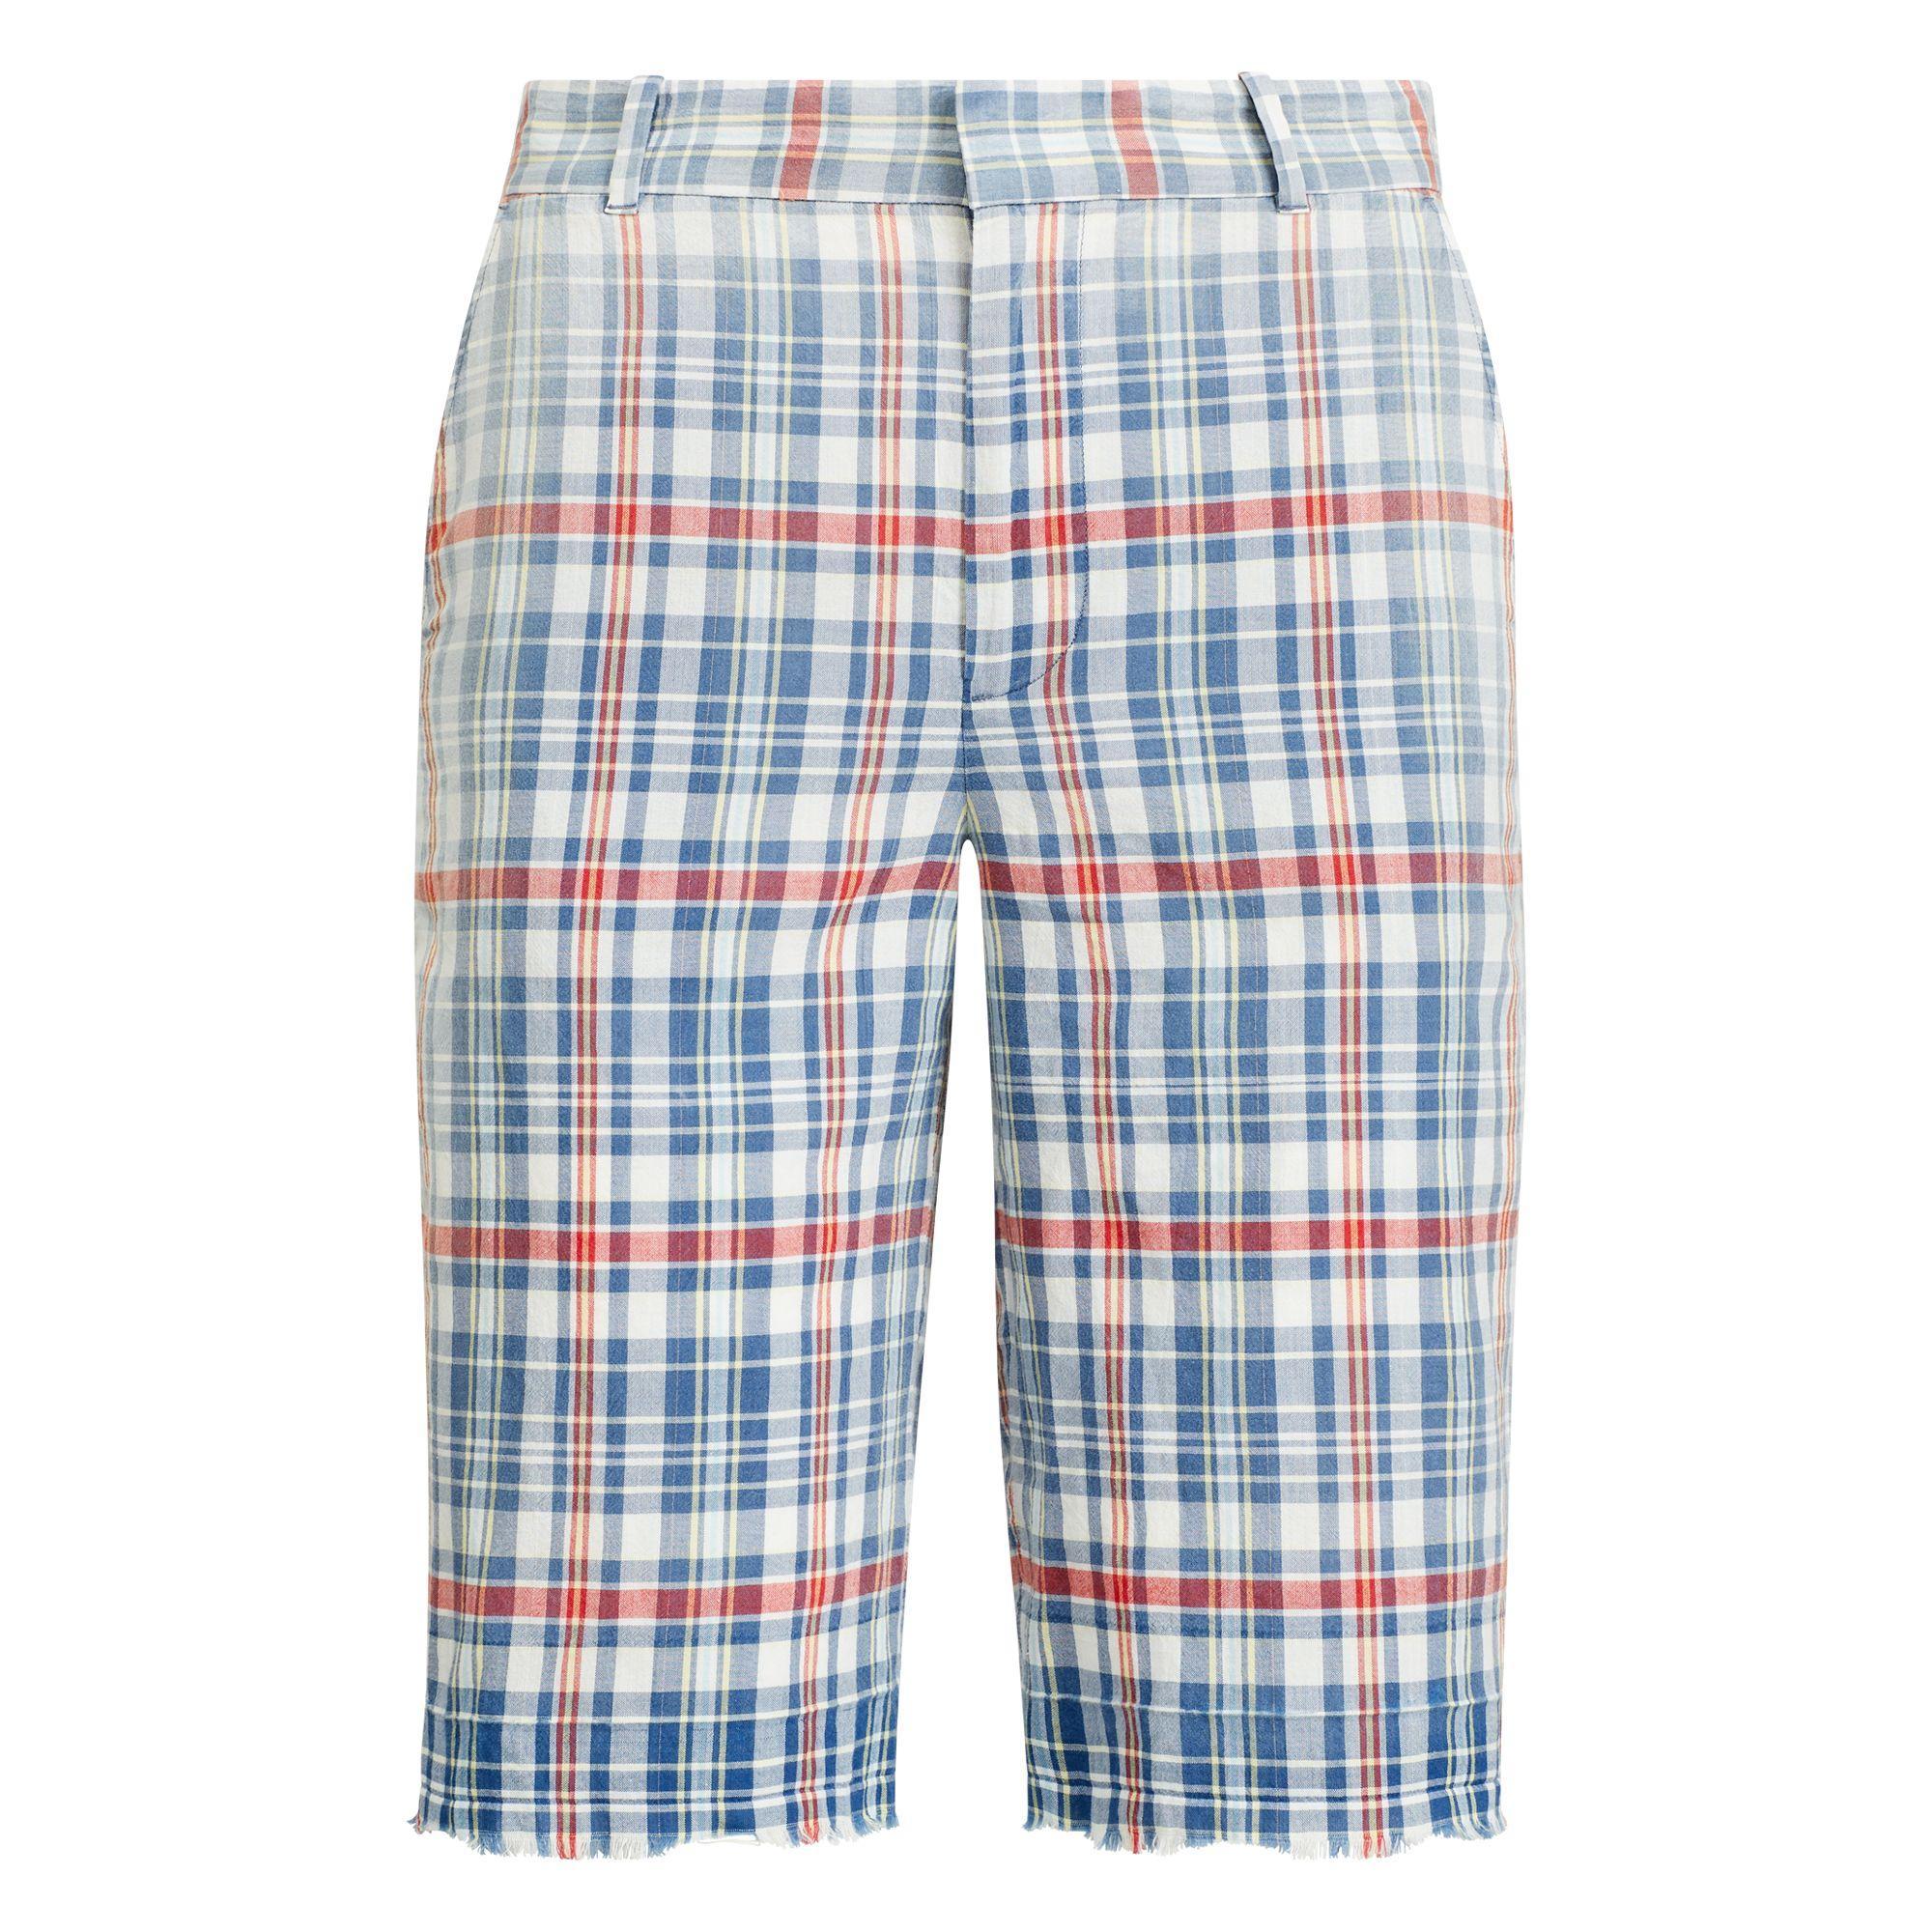 52799d782 Lyst - Polo Ralph Lauren Madras Bermuda Short in Blue